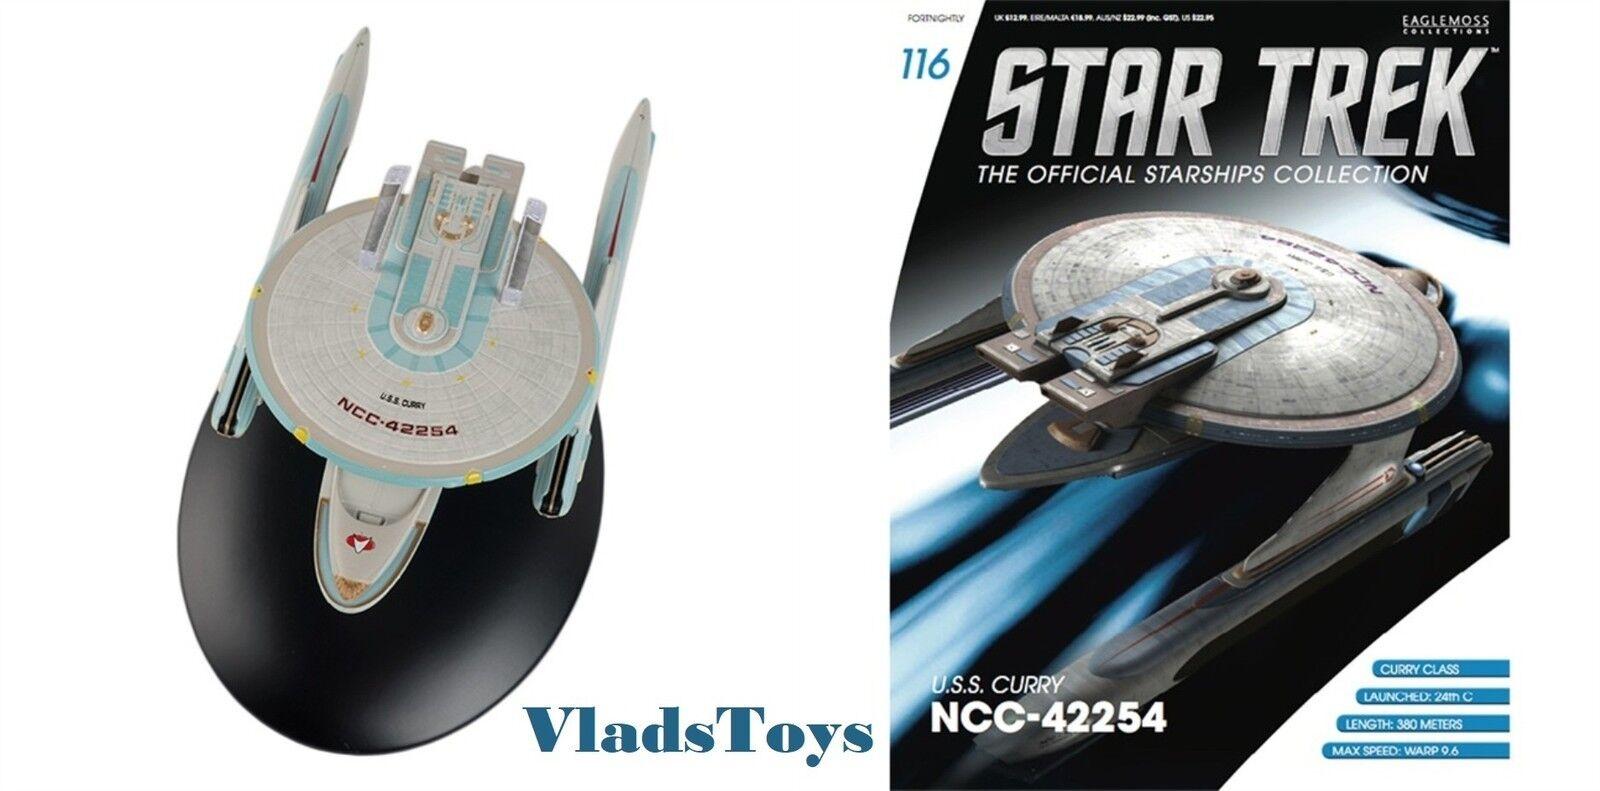 Eaglemoss Star Trek USS Curry NCC-42254 Starship with Magazine